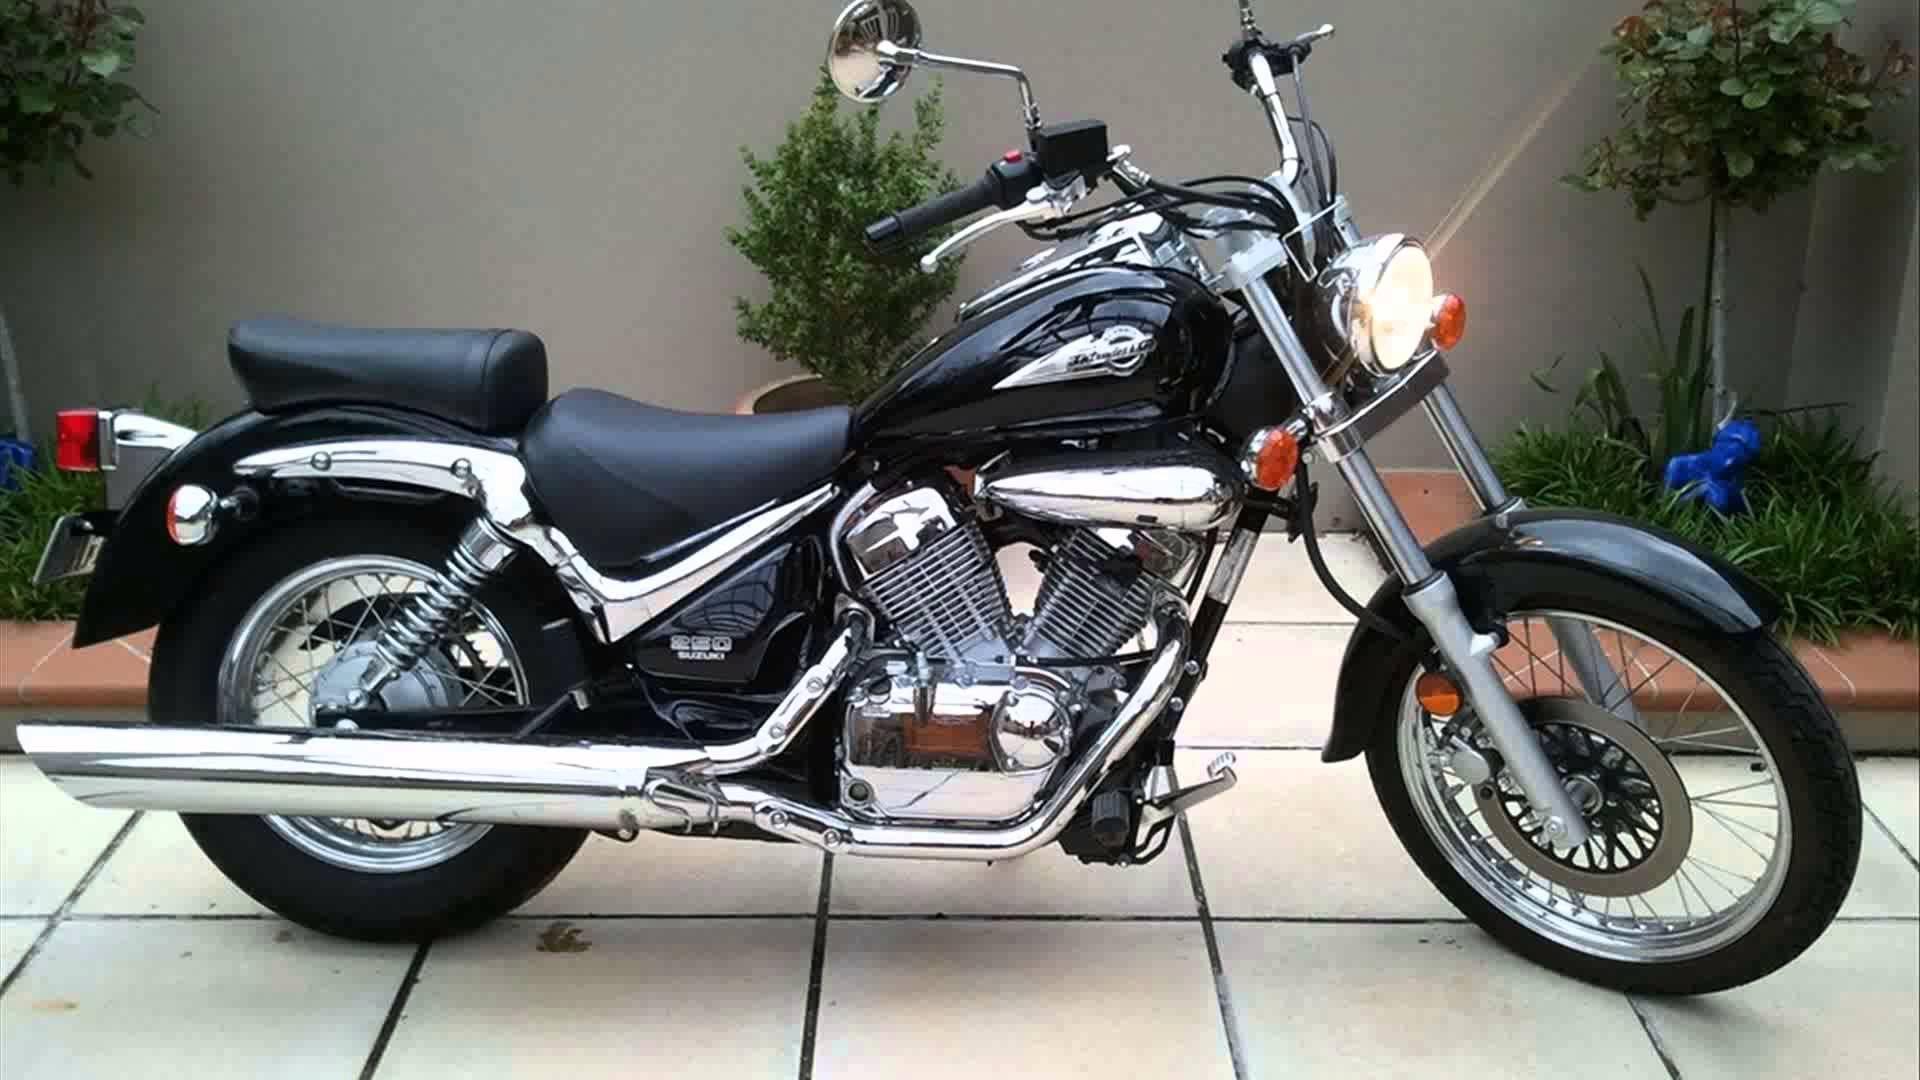 Motorcycles Stolen from School Driving Education Program